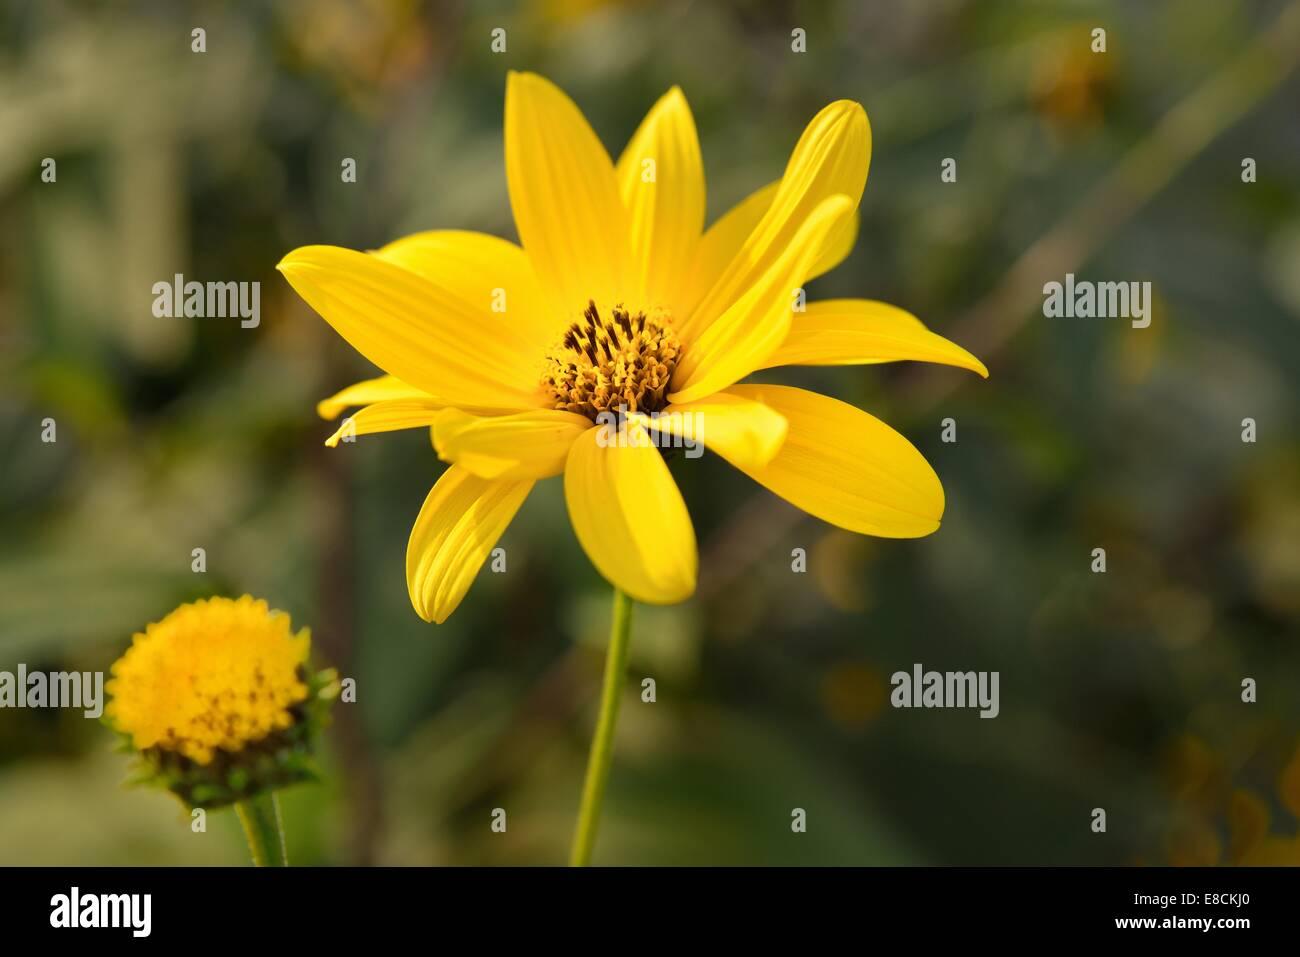 Jerusalem artichoke or Topinambur (Helianthus tuberosus). - Stock Image